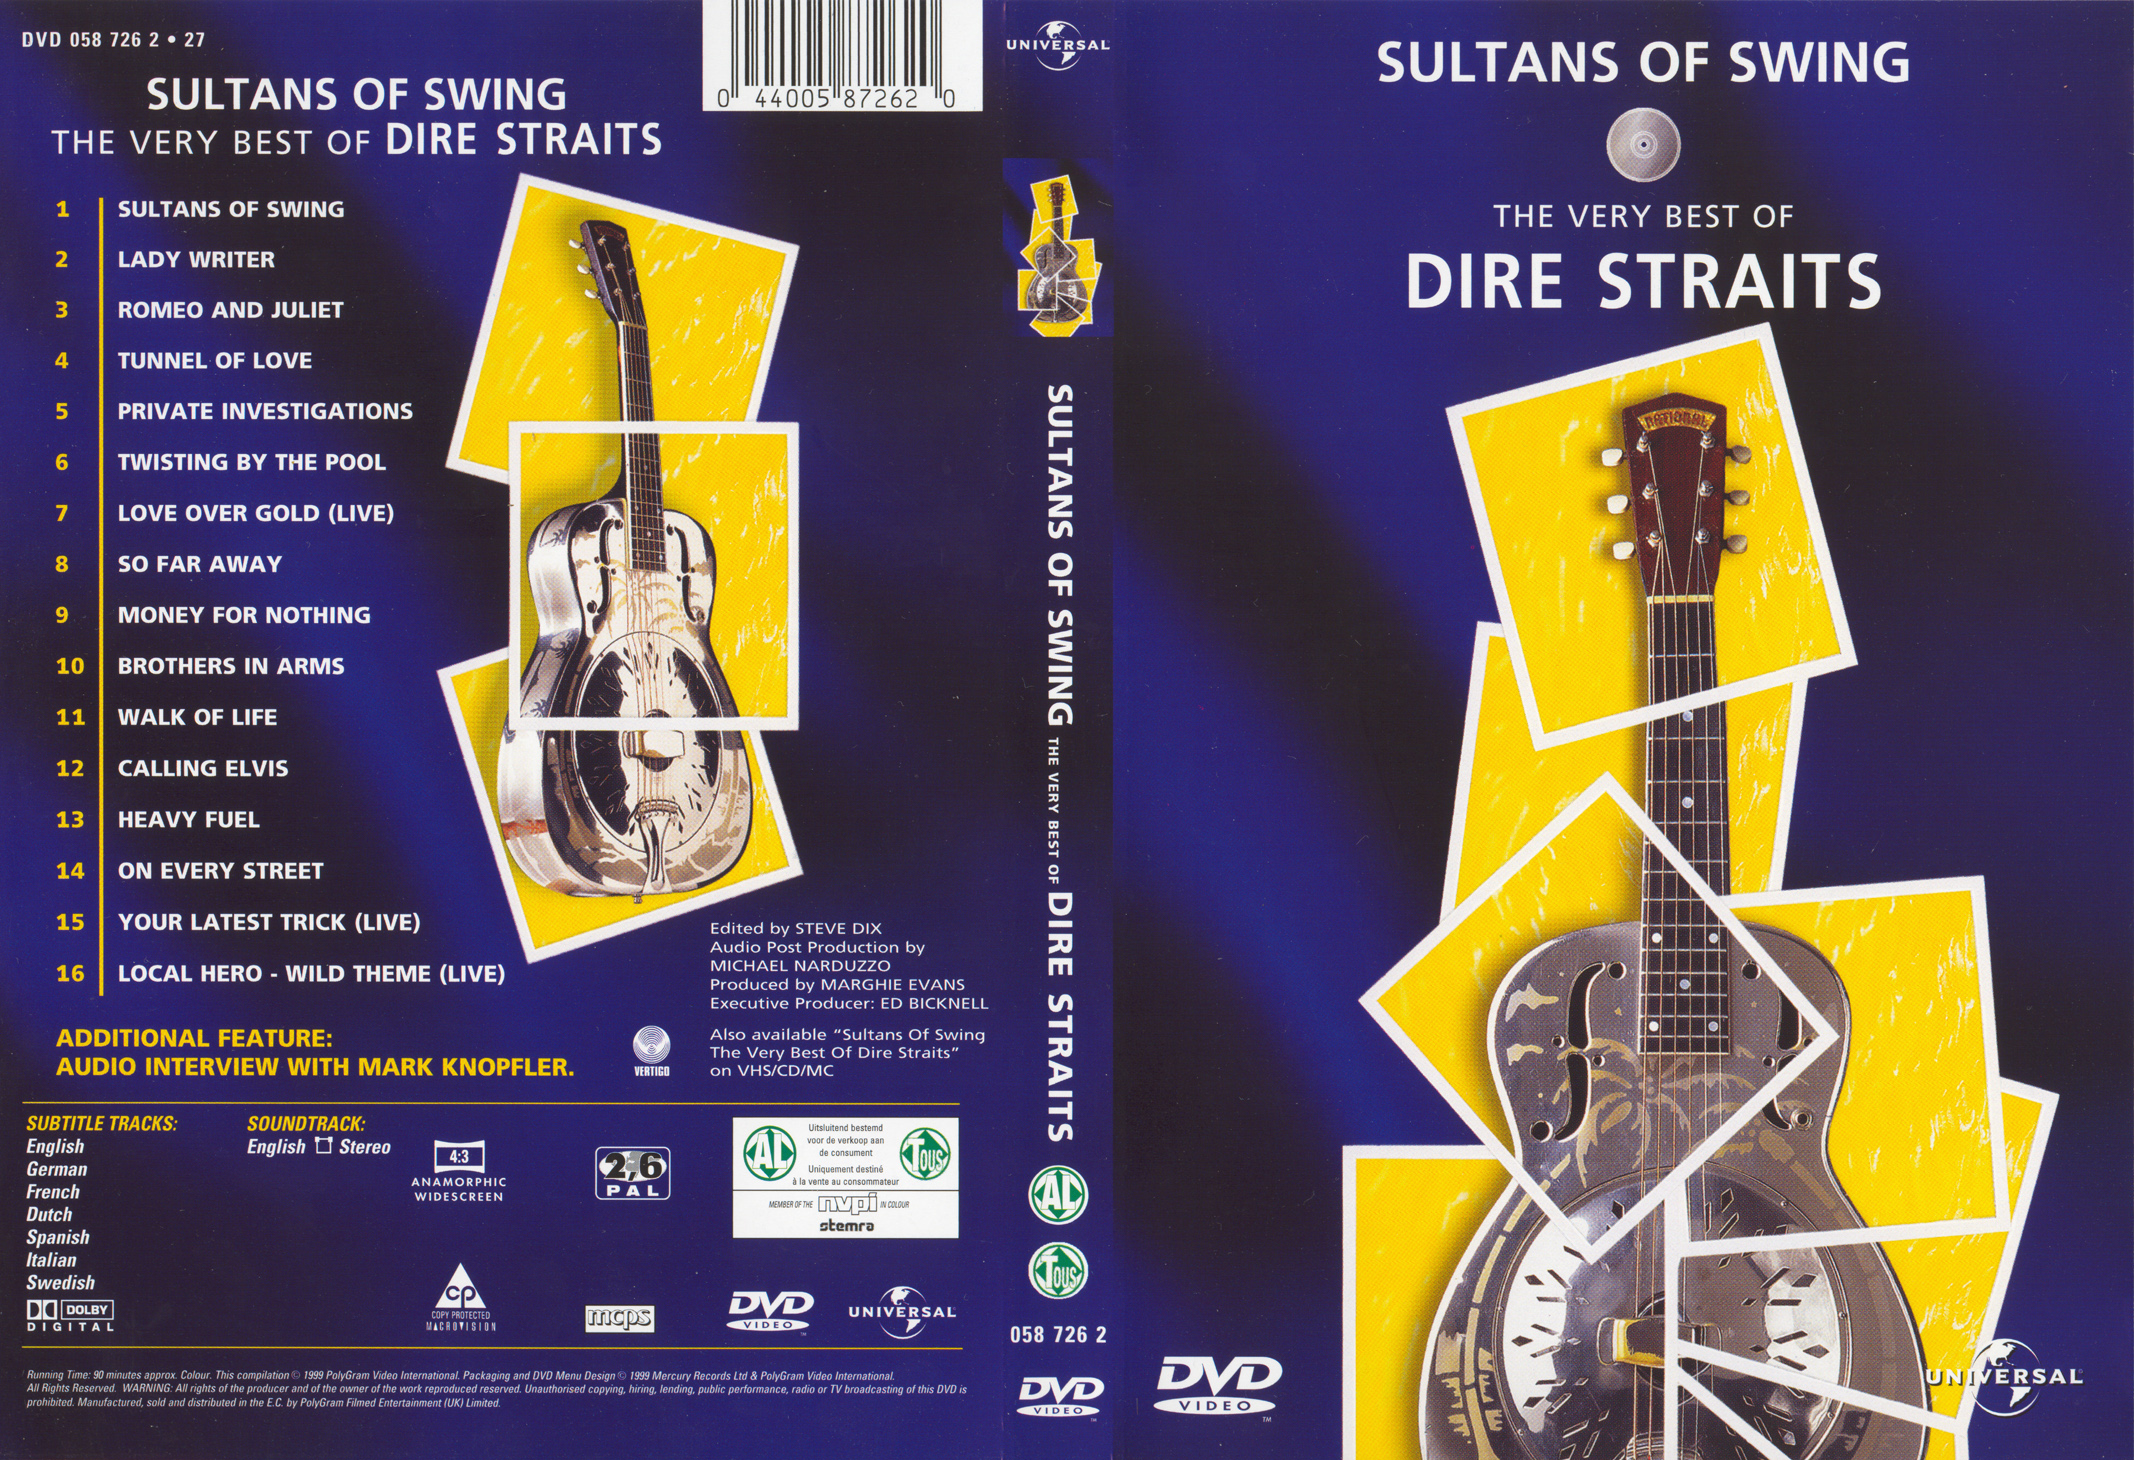 Swing album download sultans straits dire of Dire Straits